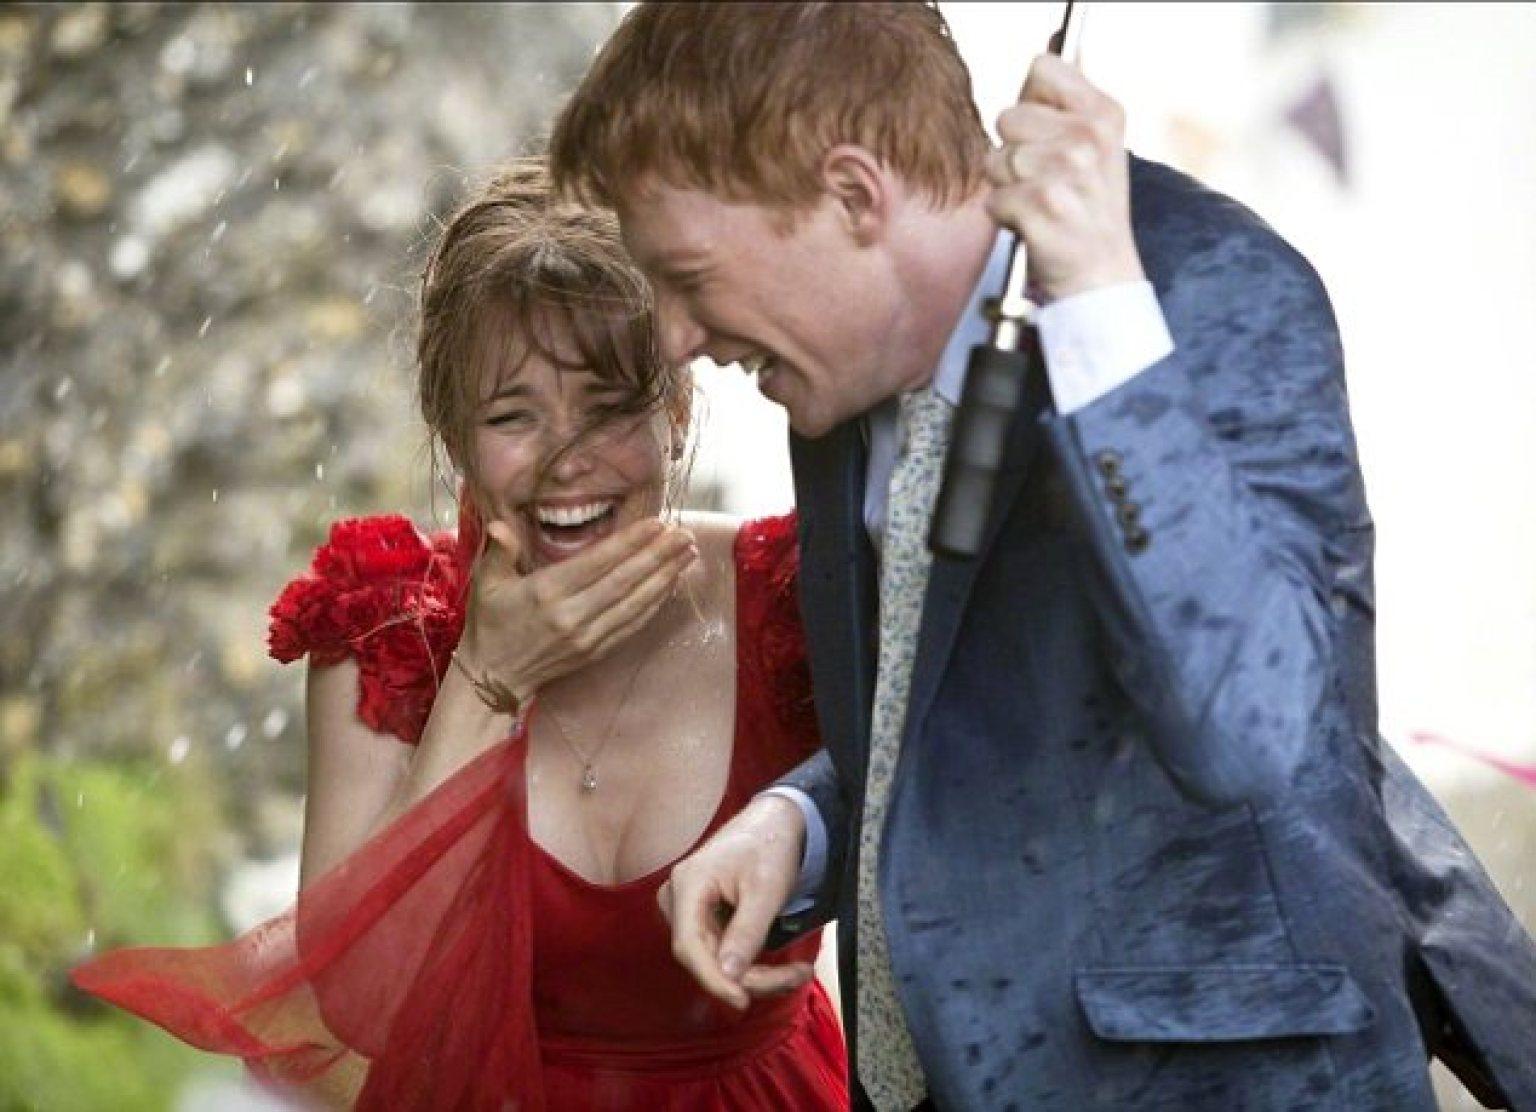 Mary (Rachel McAdams) and Tim (Domhnall Gleeson).